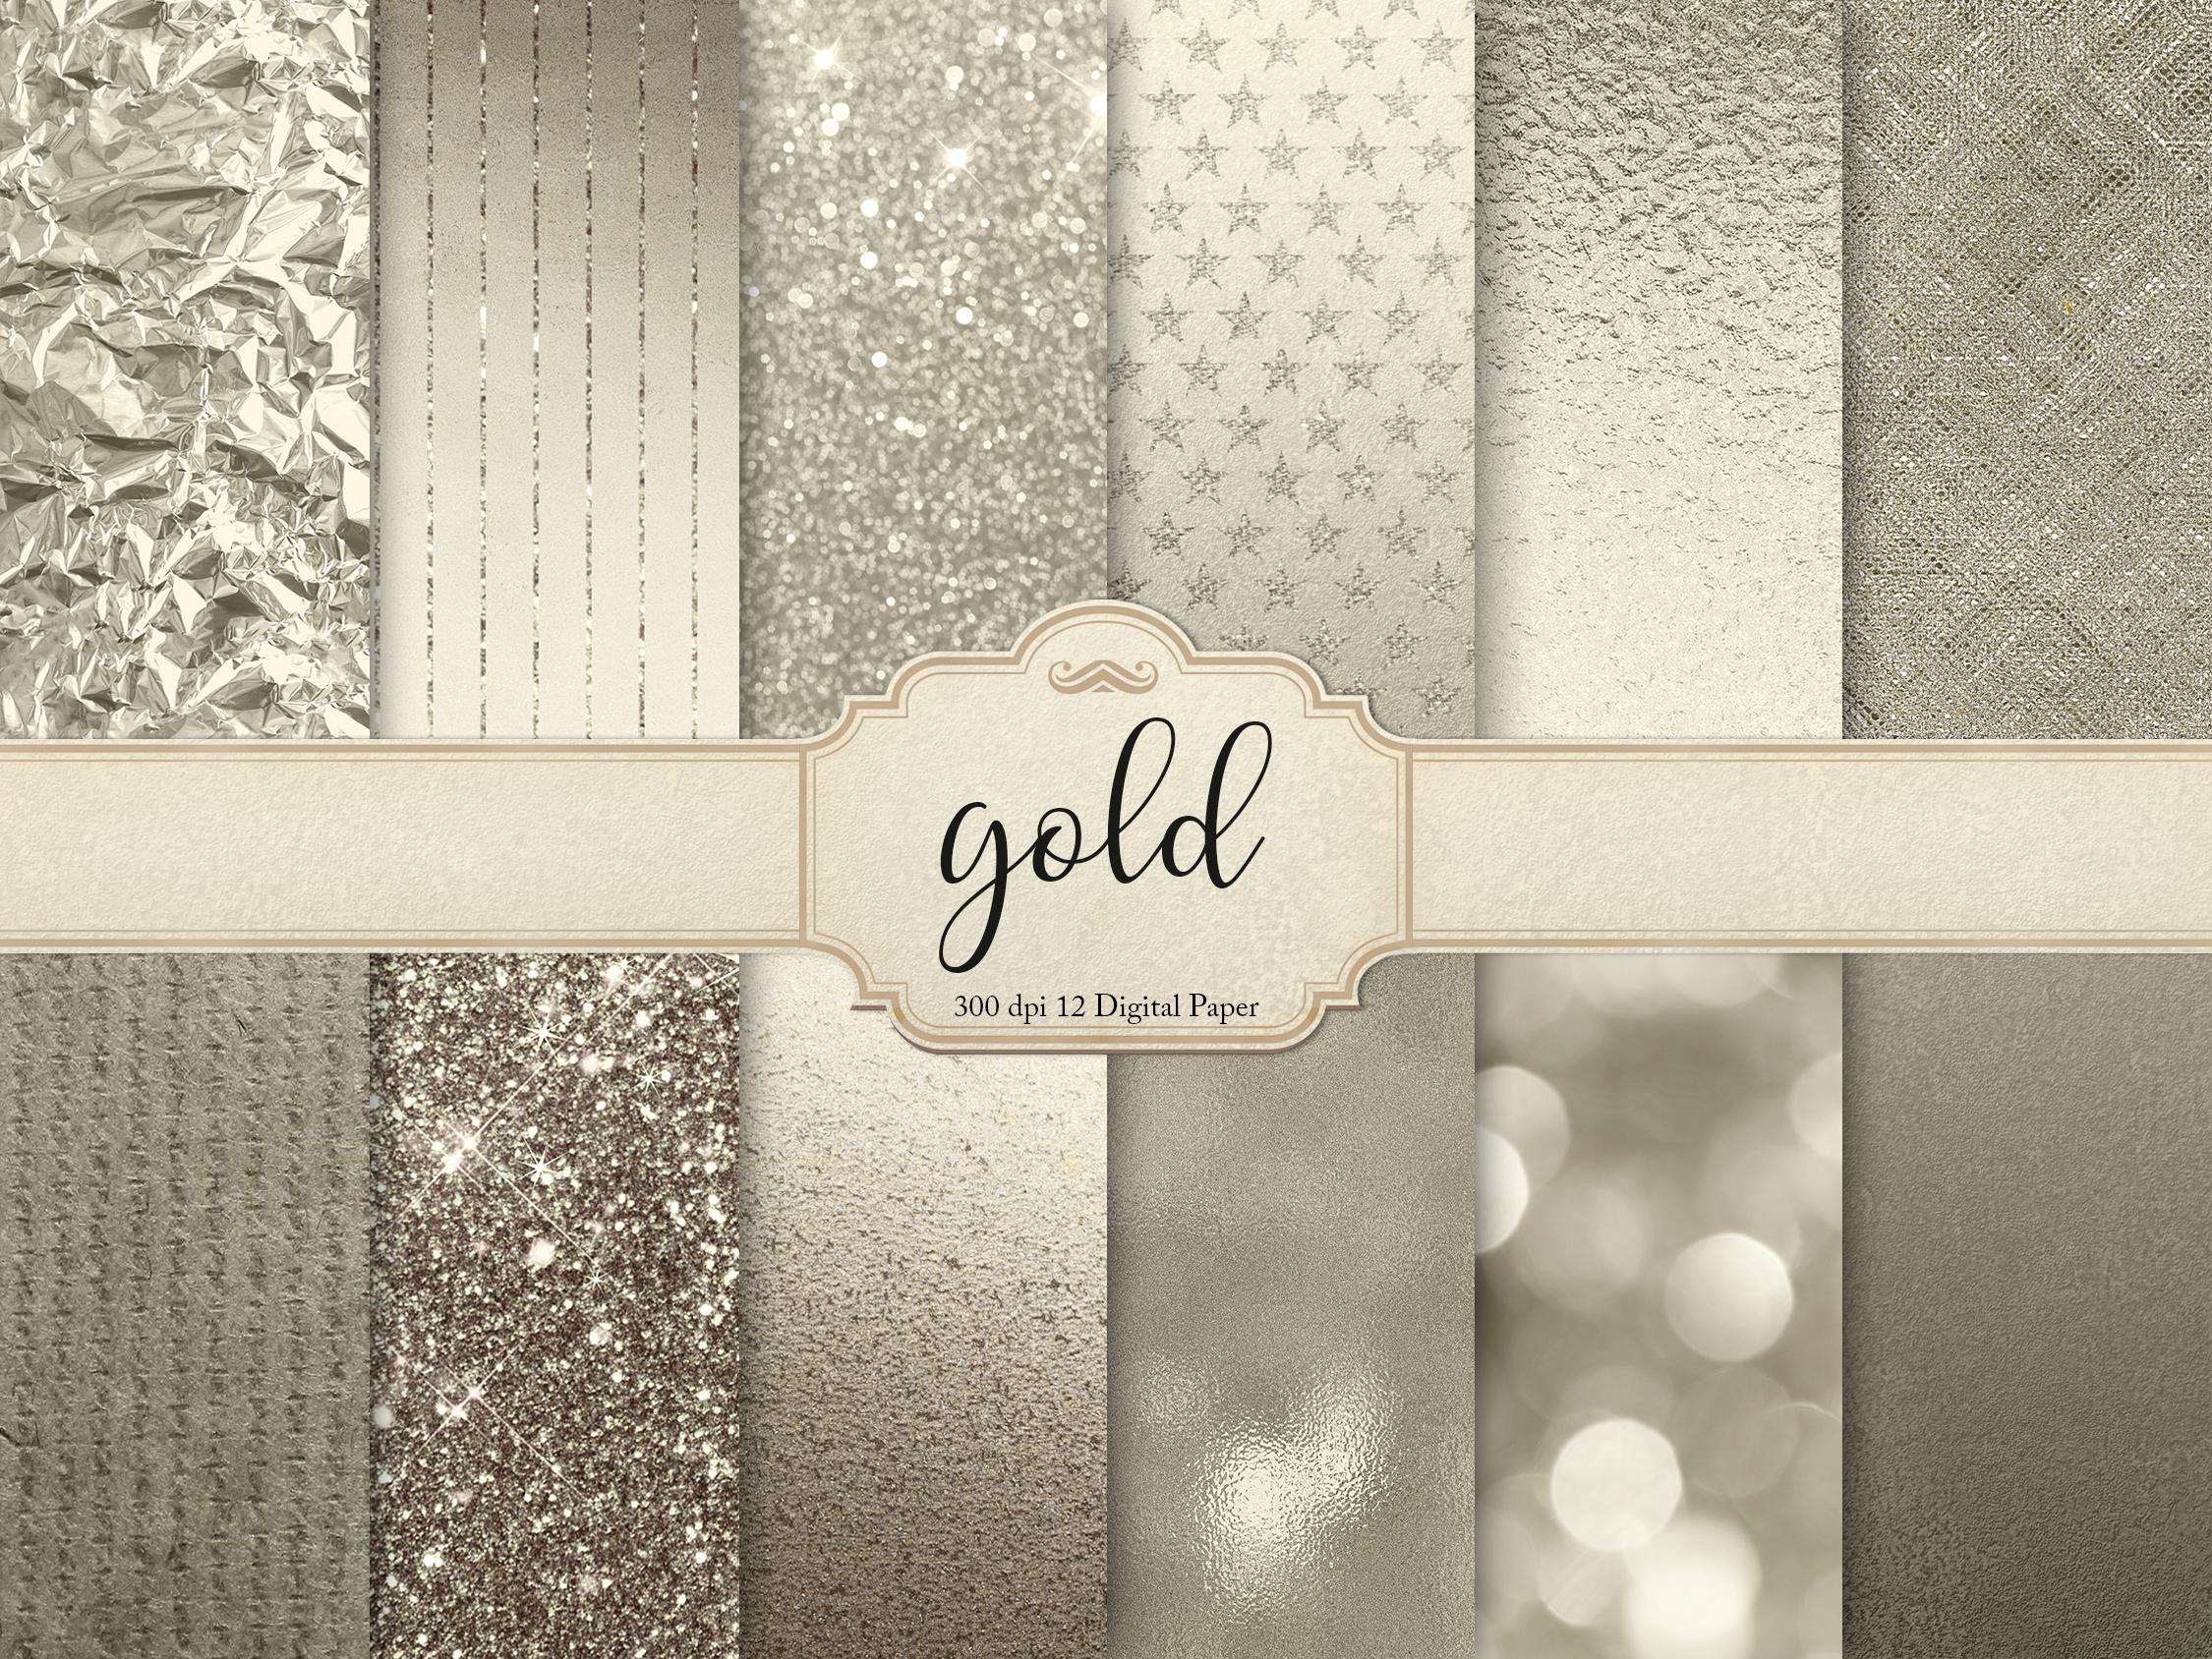 Metallic Textures, Backgrounds example image 1